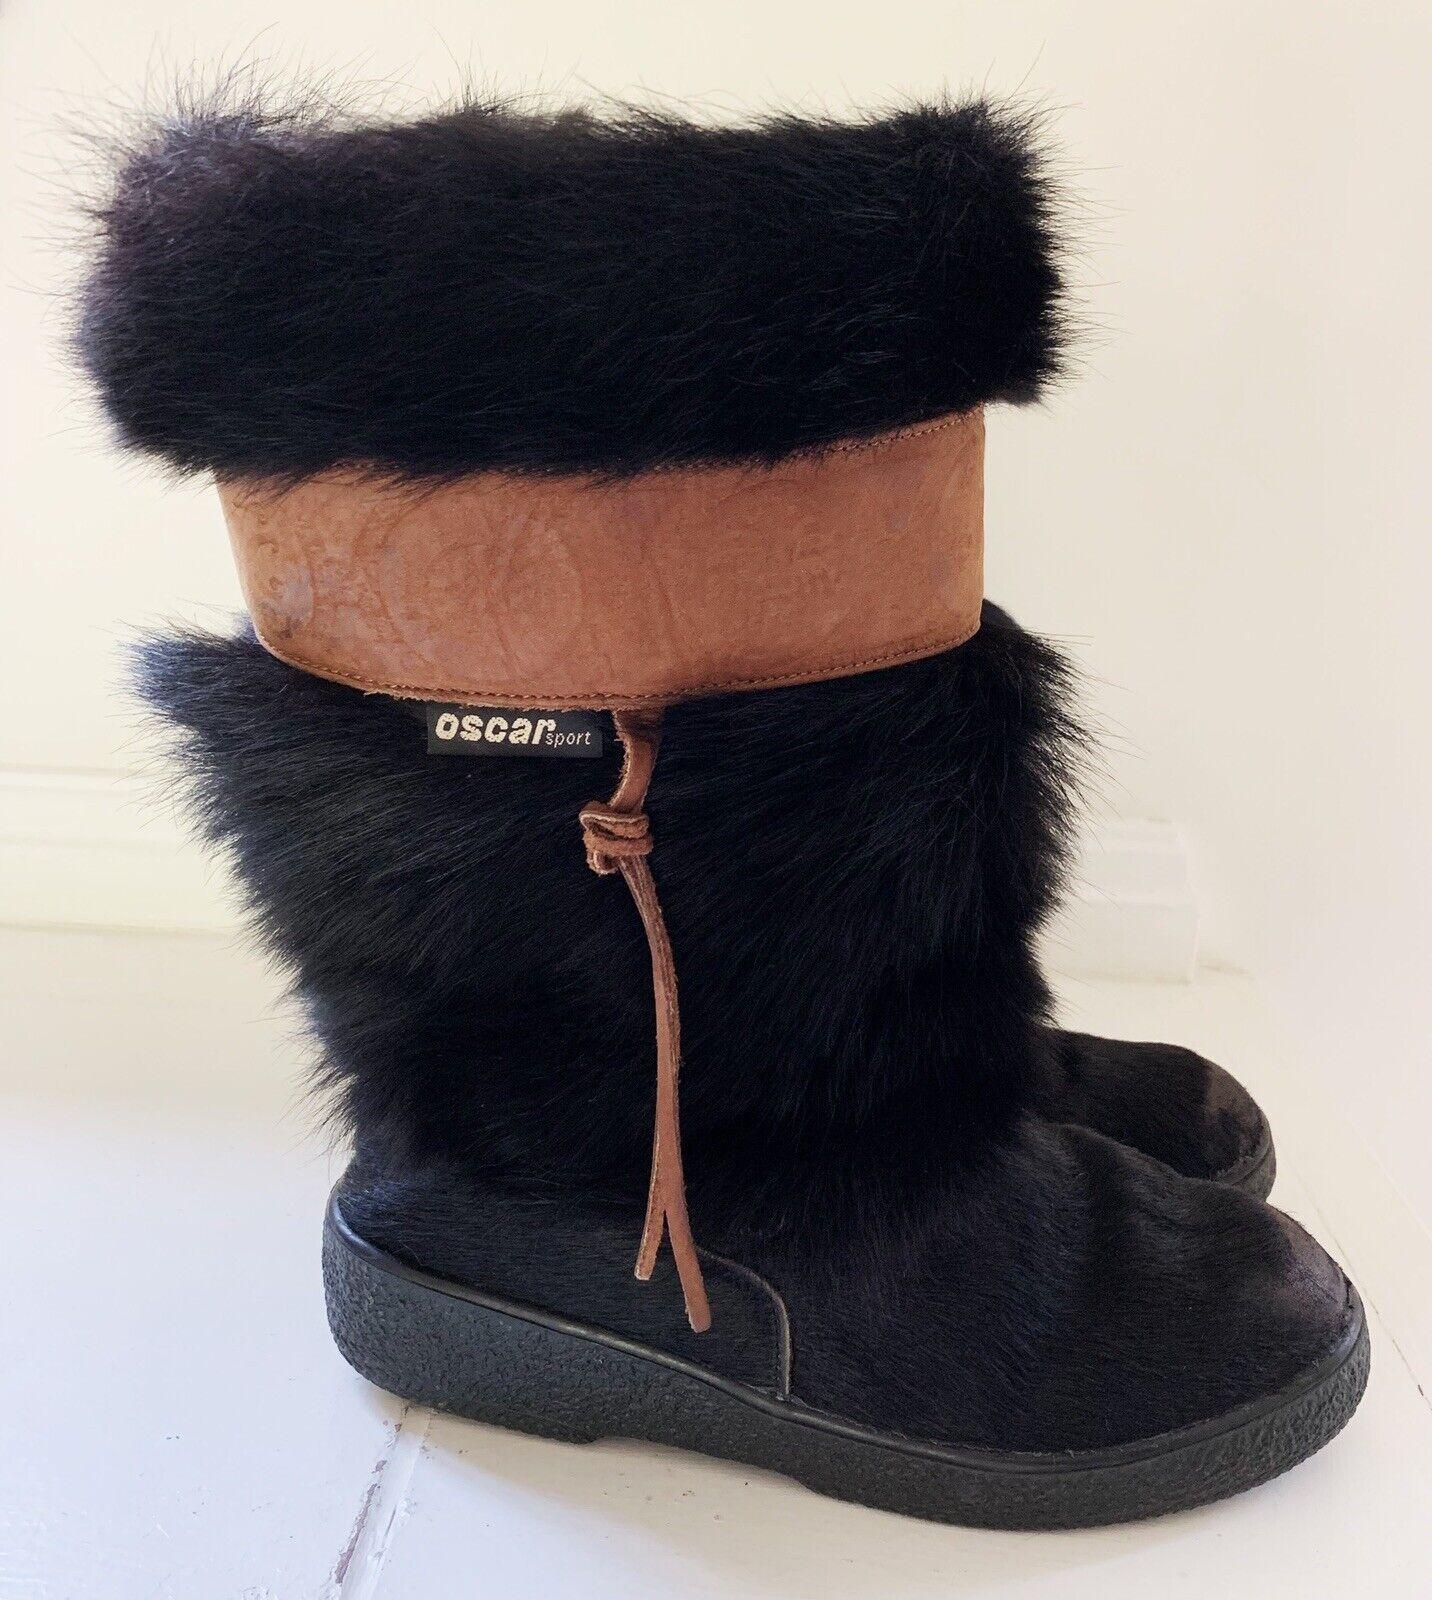 Oscar Sport Italia Cristina Mujeres Imitación Piel botas Sz 38 (7) Negro Marrón acentos